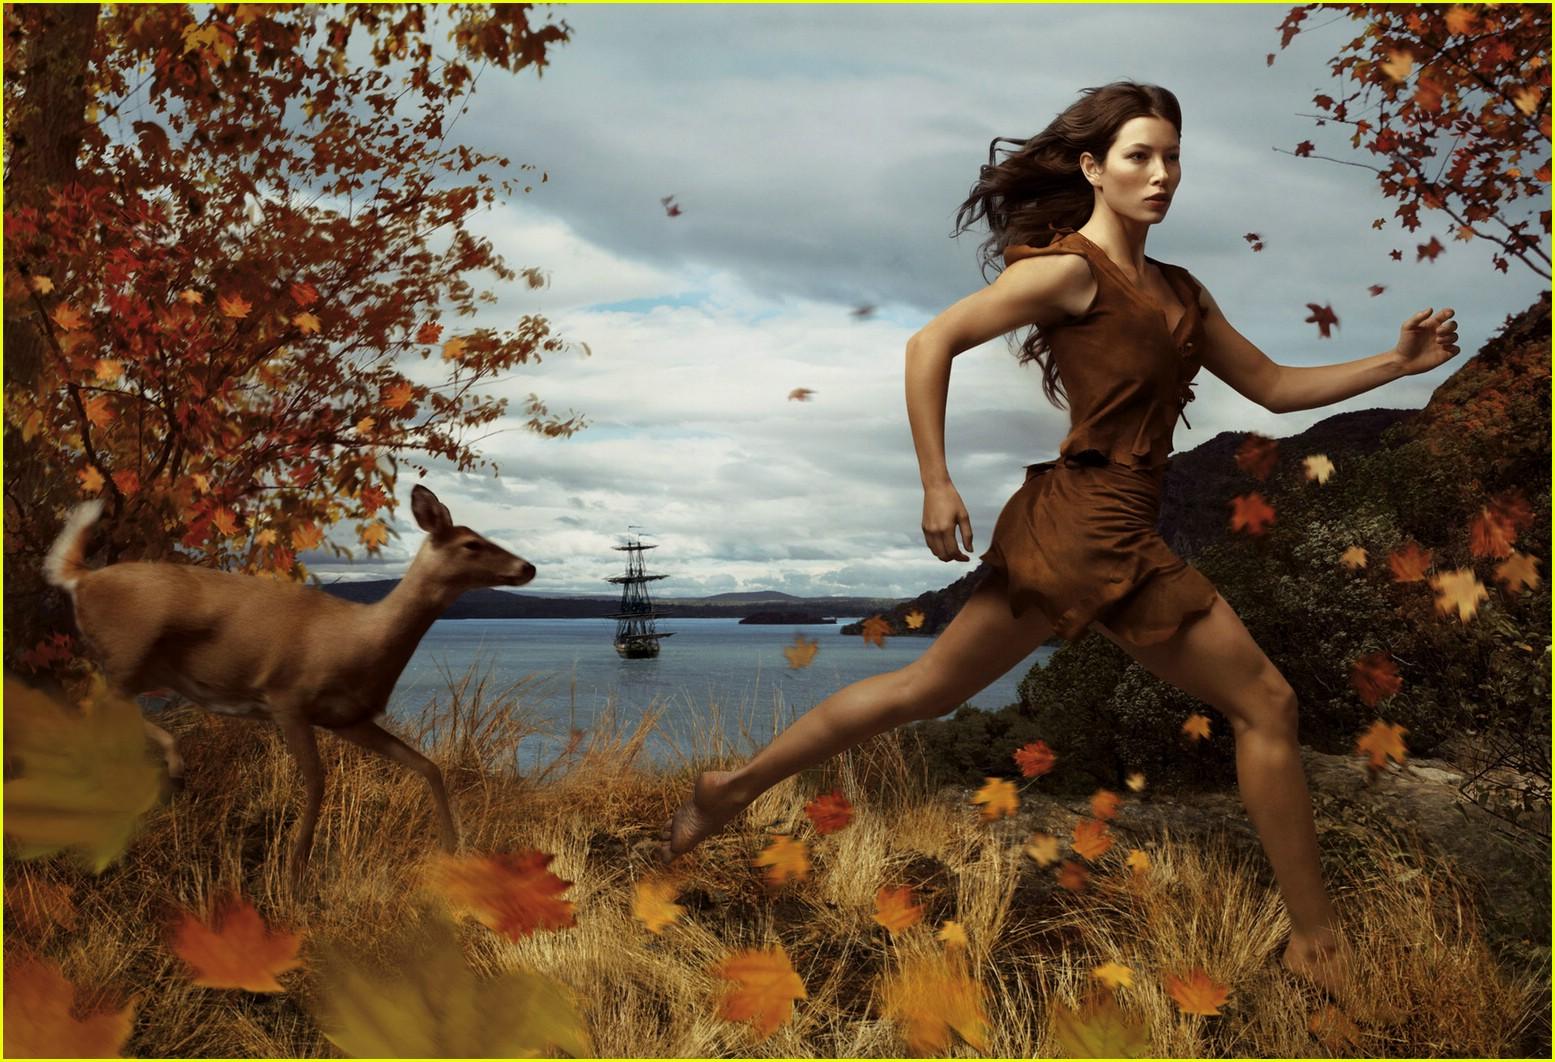 http://3.bp.blogspot.com/_vvDWoG_XX-0/TQn17BXKoKI/AAAAAAAABGI/B02mQTEHQyc/s1600/disney-dream-ads-annie-leibovitz-04.jpg